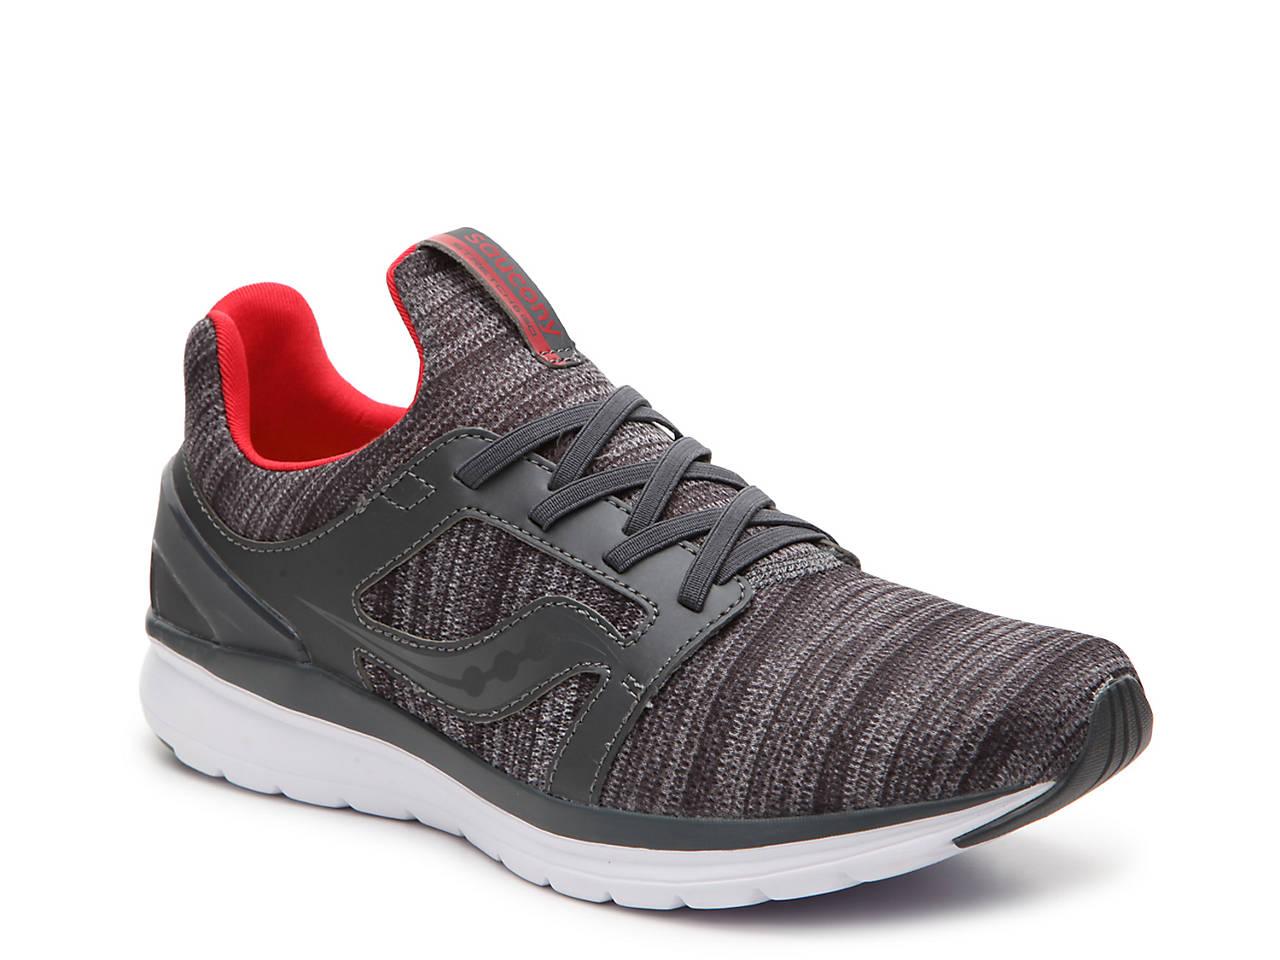 66c04bee Stretch & Go Ease Lightweight Slip-On Running Shoe - Men's